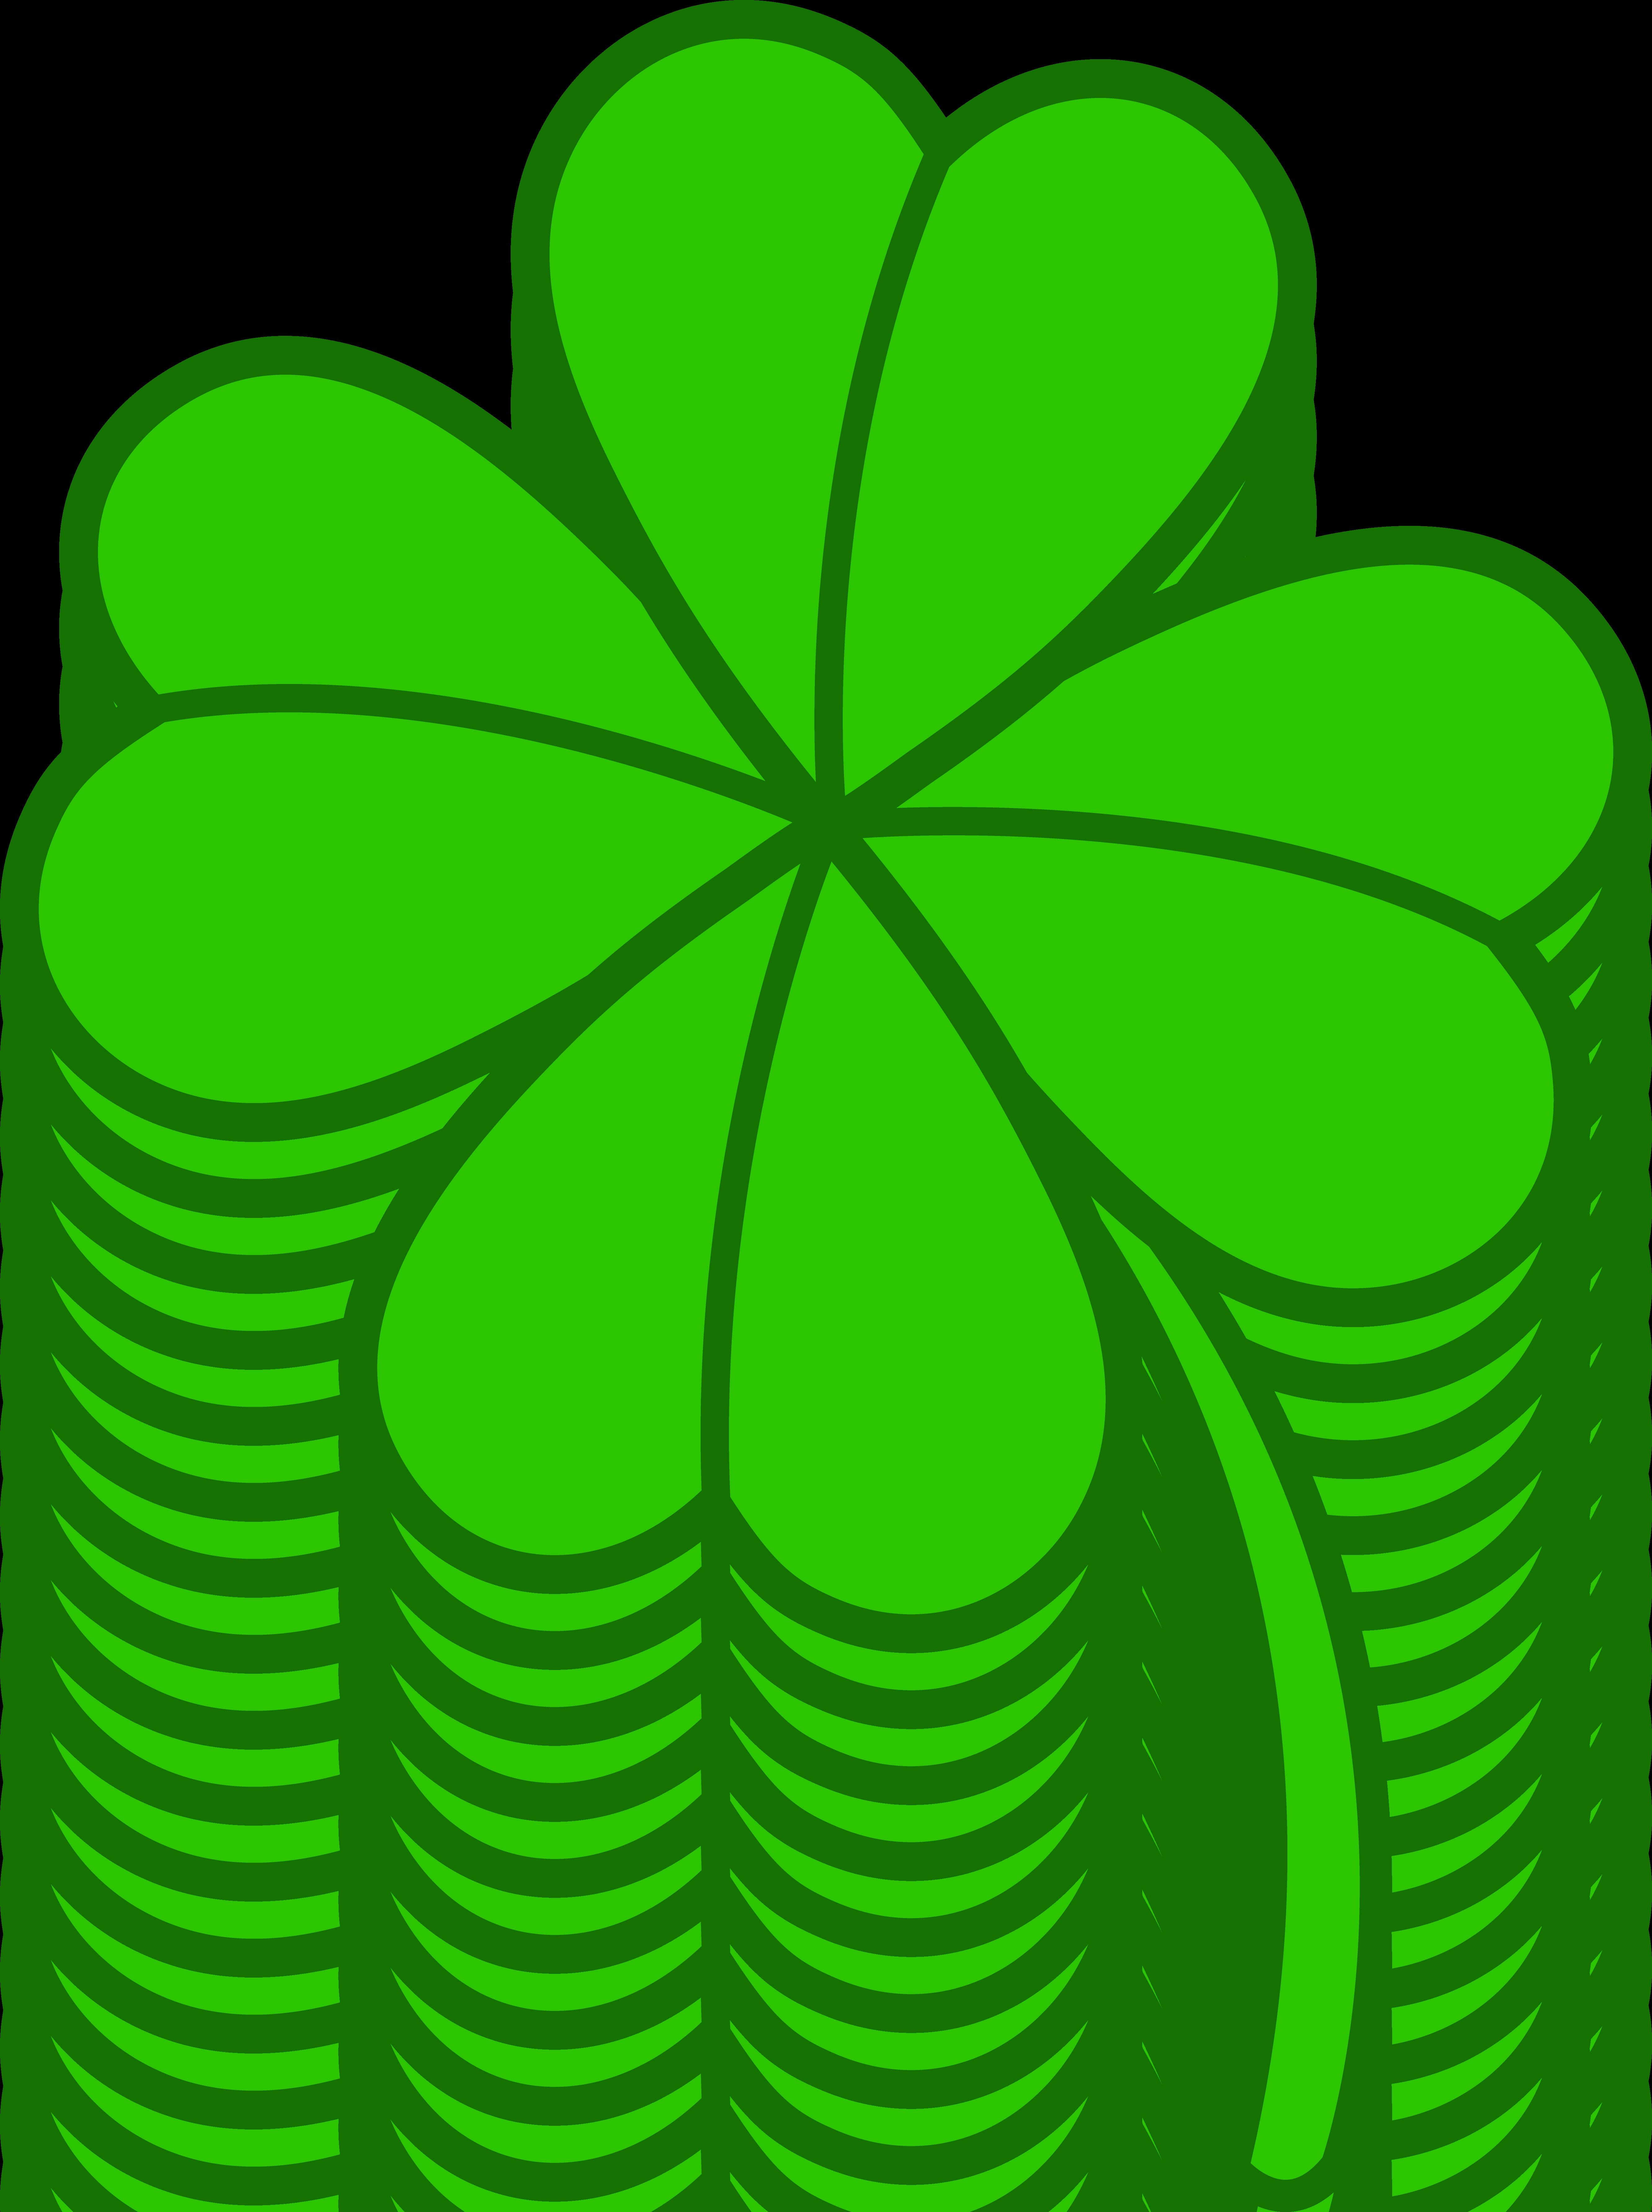 Clover clipart four leaf clover Four Version 2 Clover Leaf